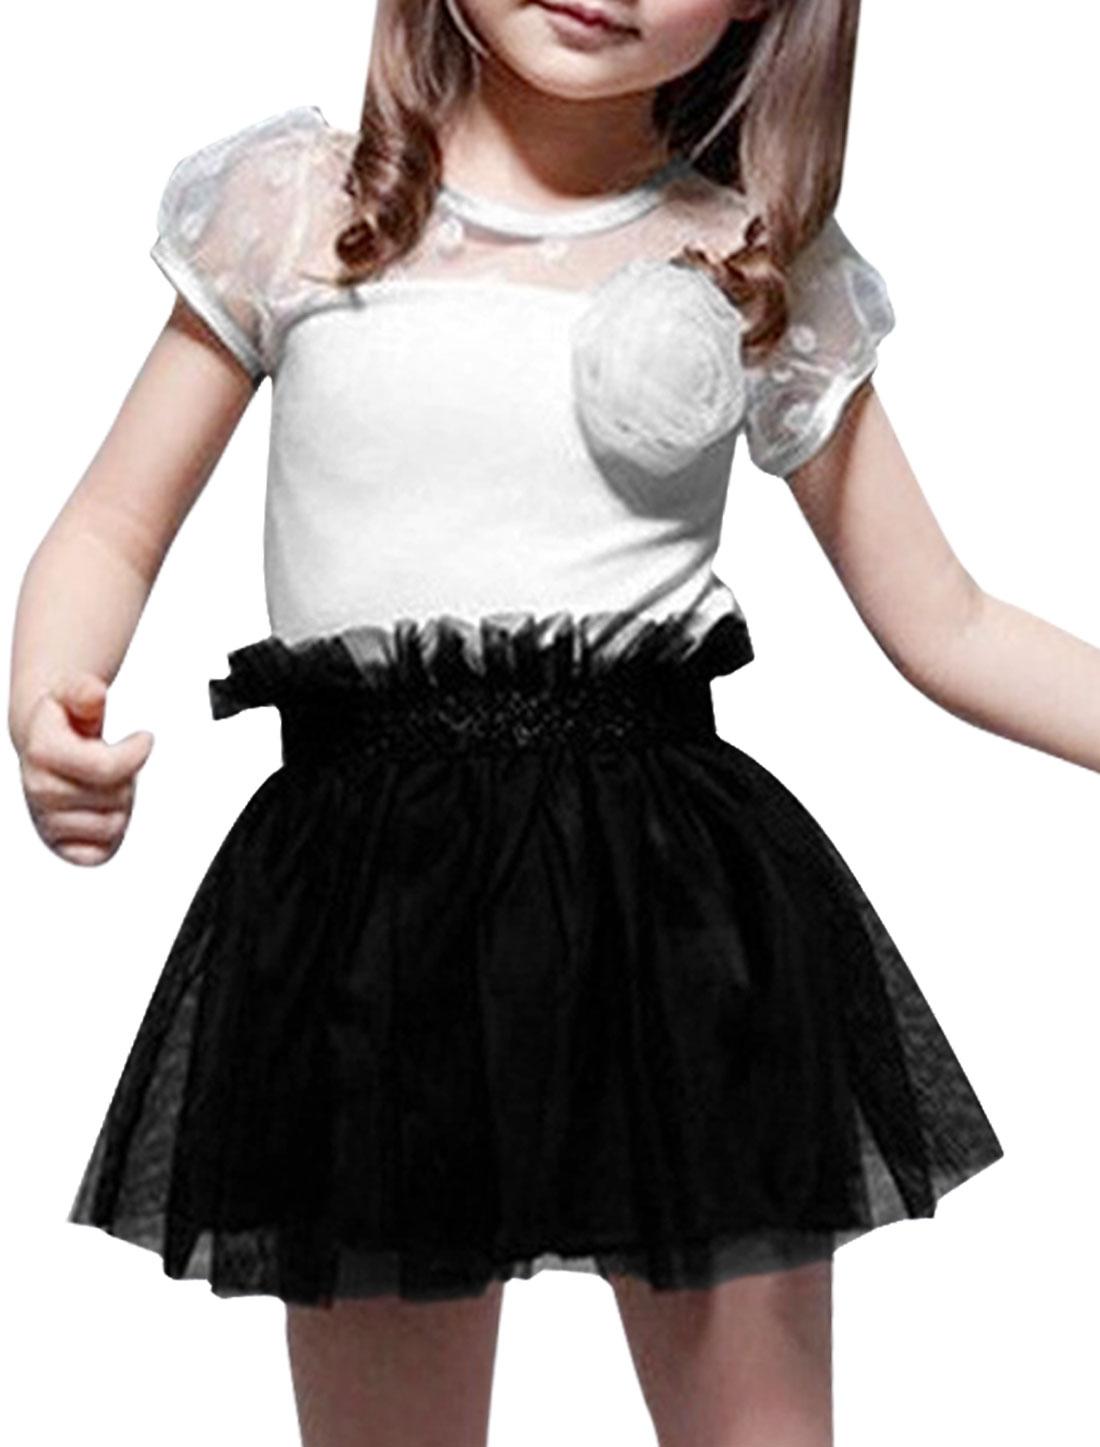 Black White 2T Round Hem Elastic Waist Pullover Style Baby Girls Dress